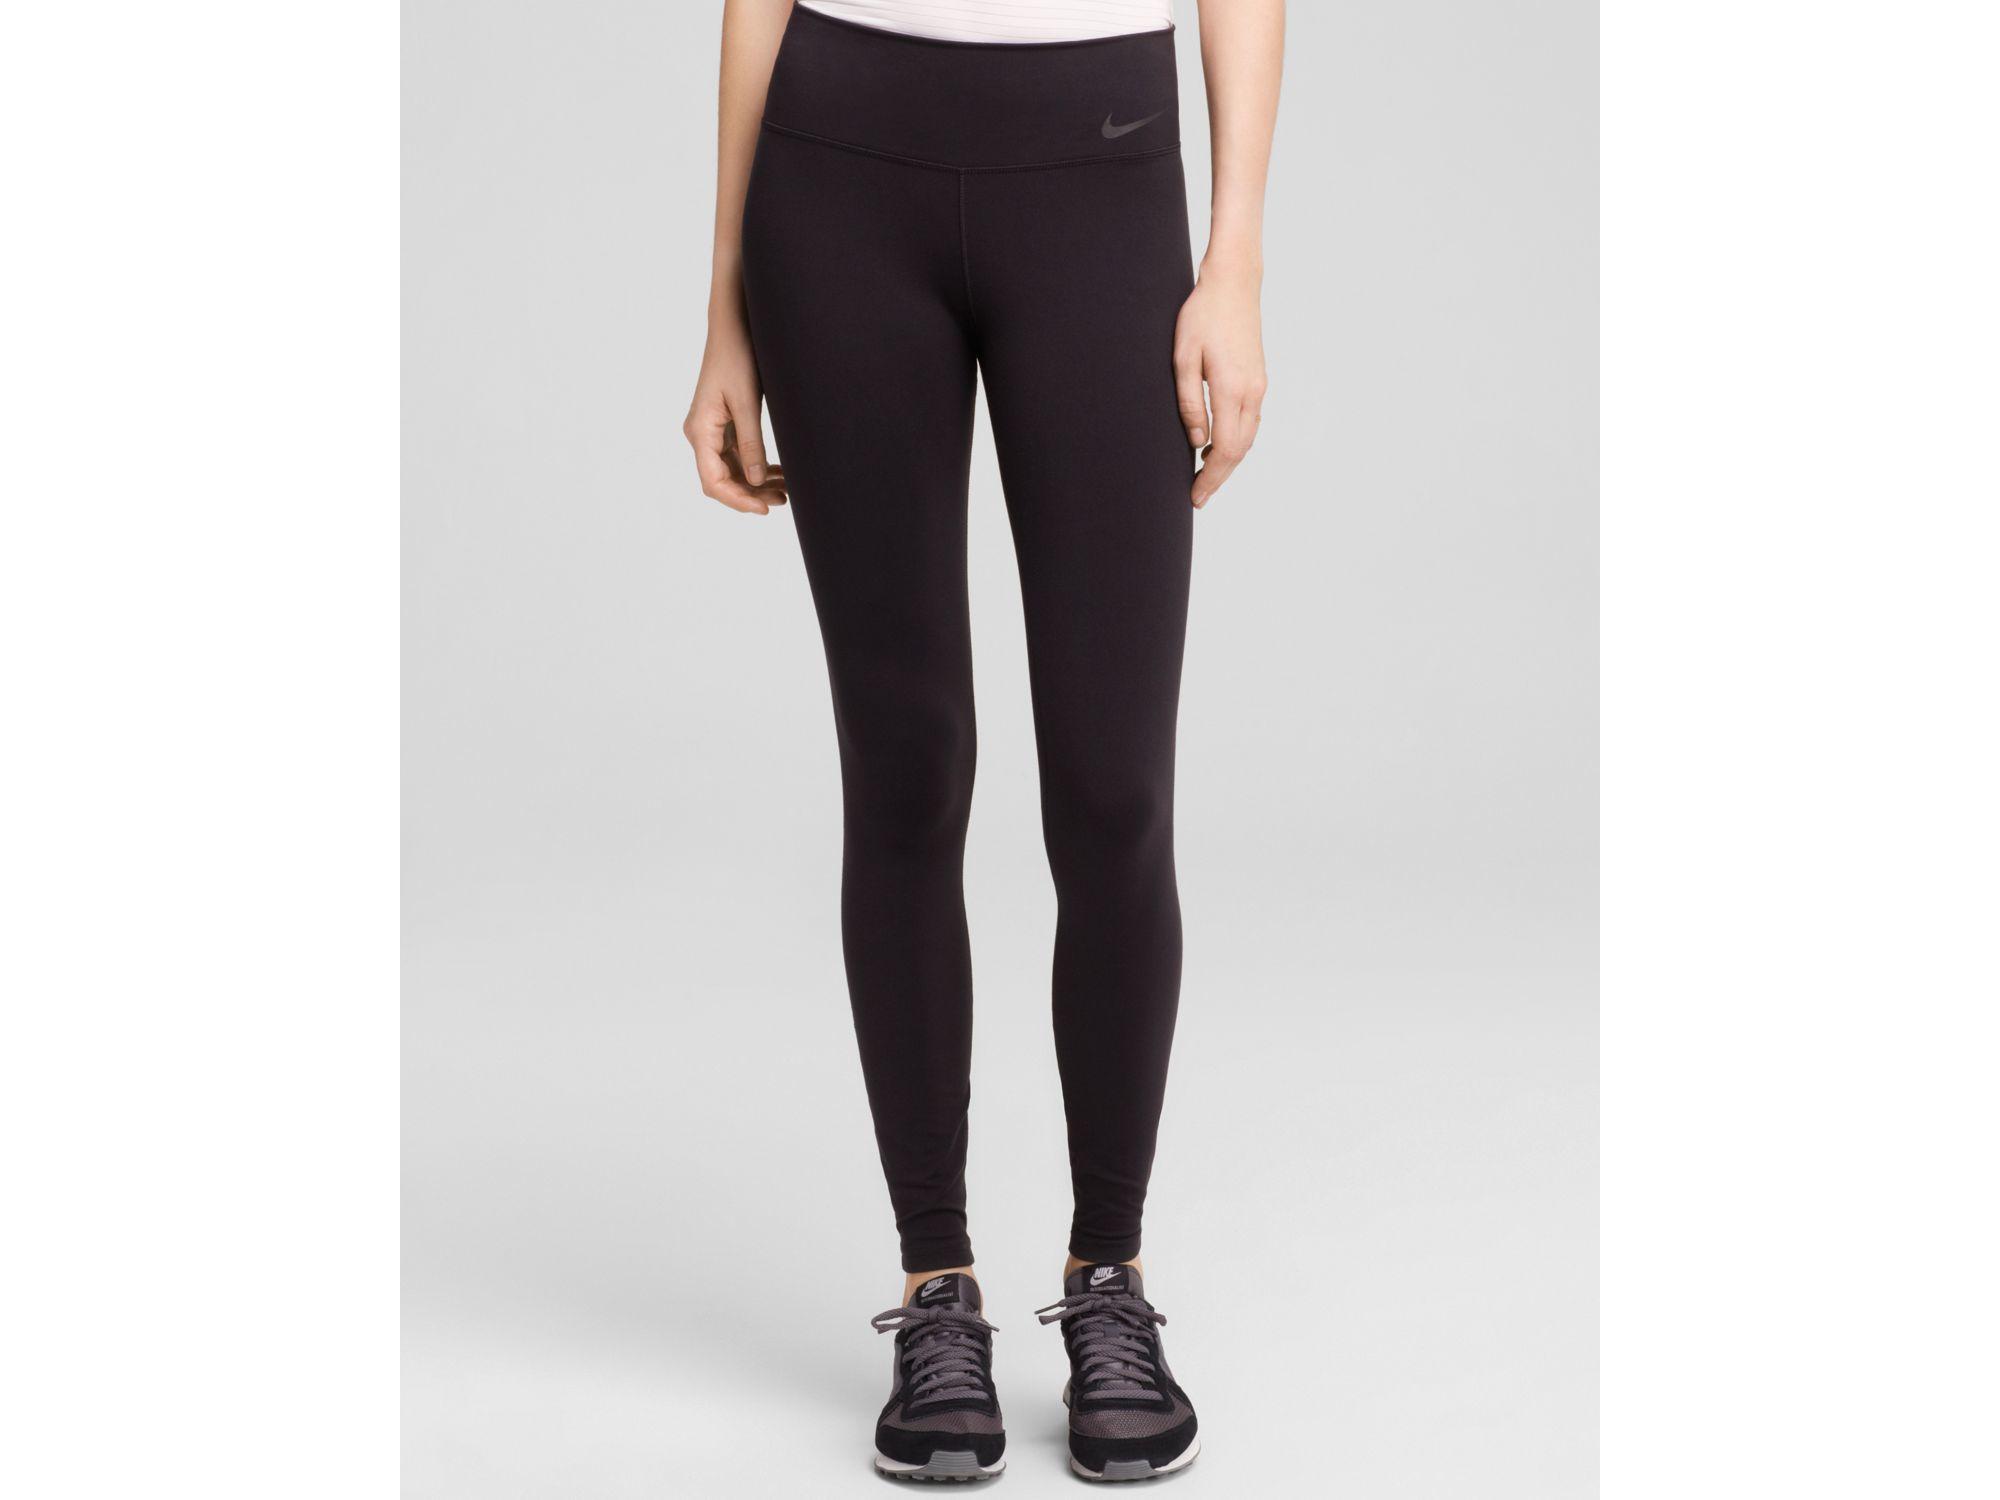 7187fa91d7f18 Lyst - Nike Leggings - Legendary Long in Black